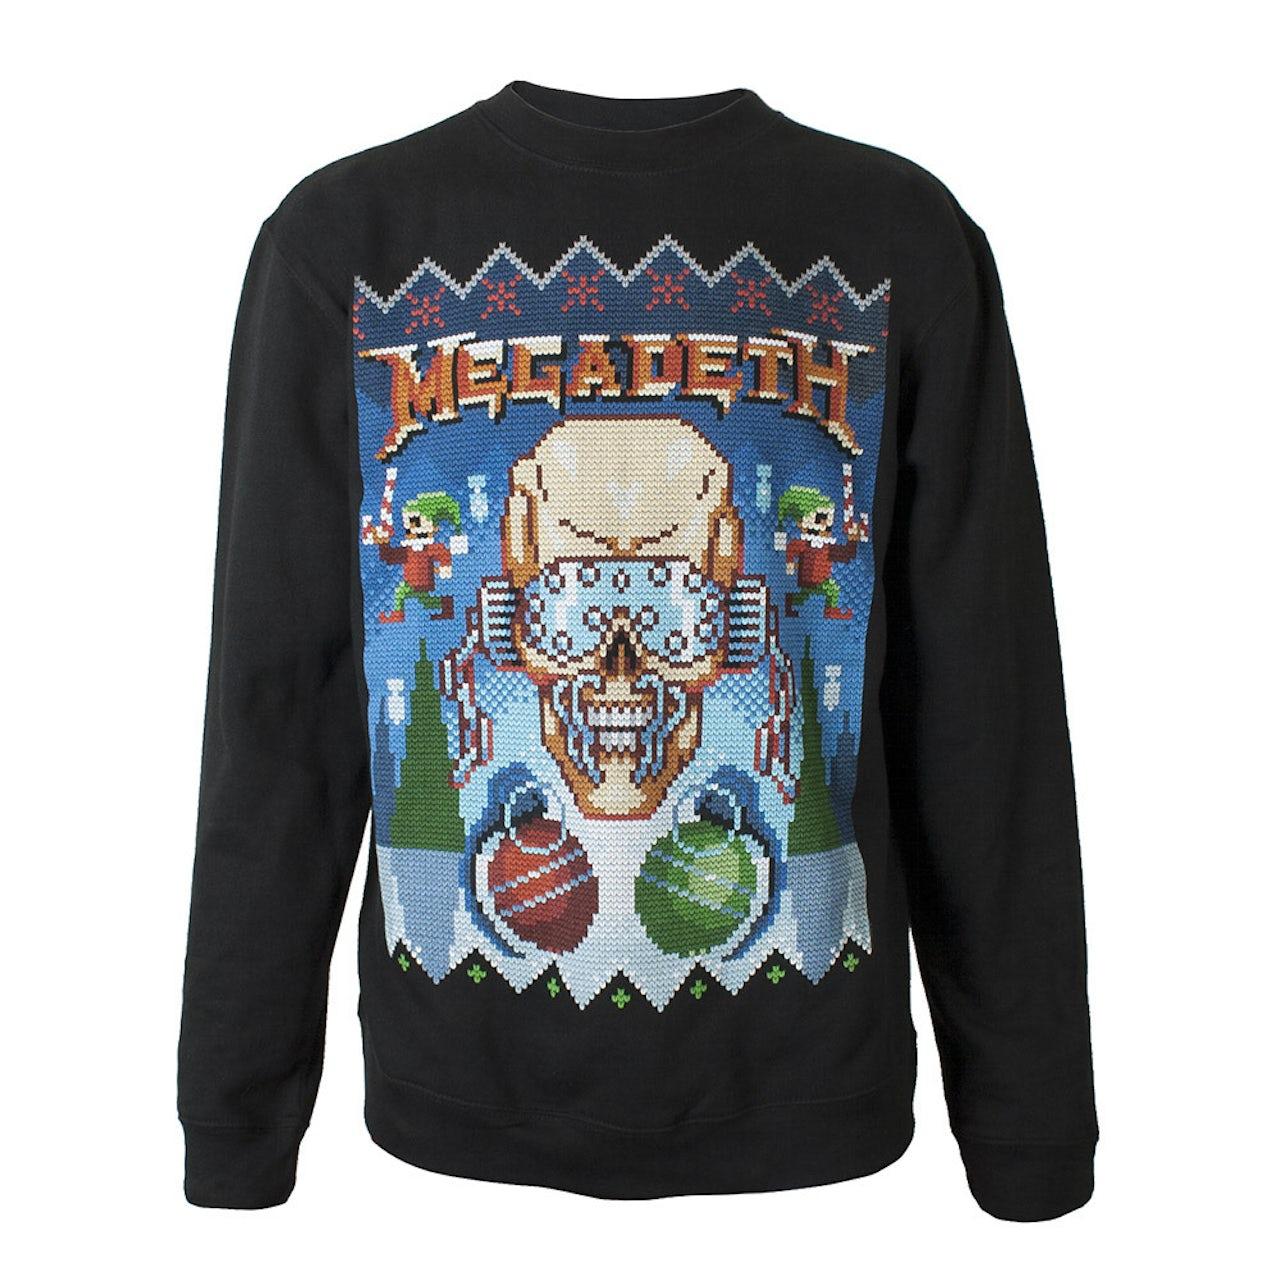 Black Sabbath Christmas Sweater.Ugly Megadeth Christmas Crewneck Sweatshirt